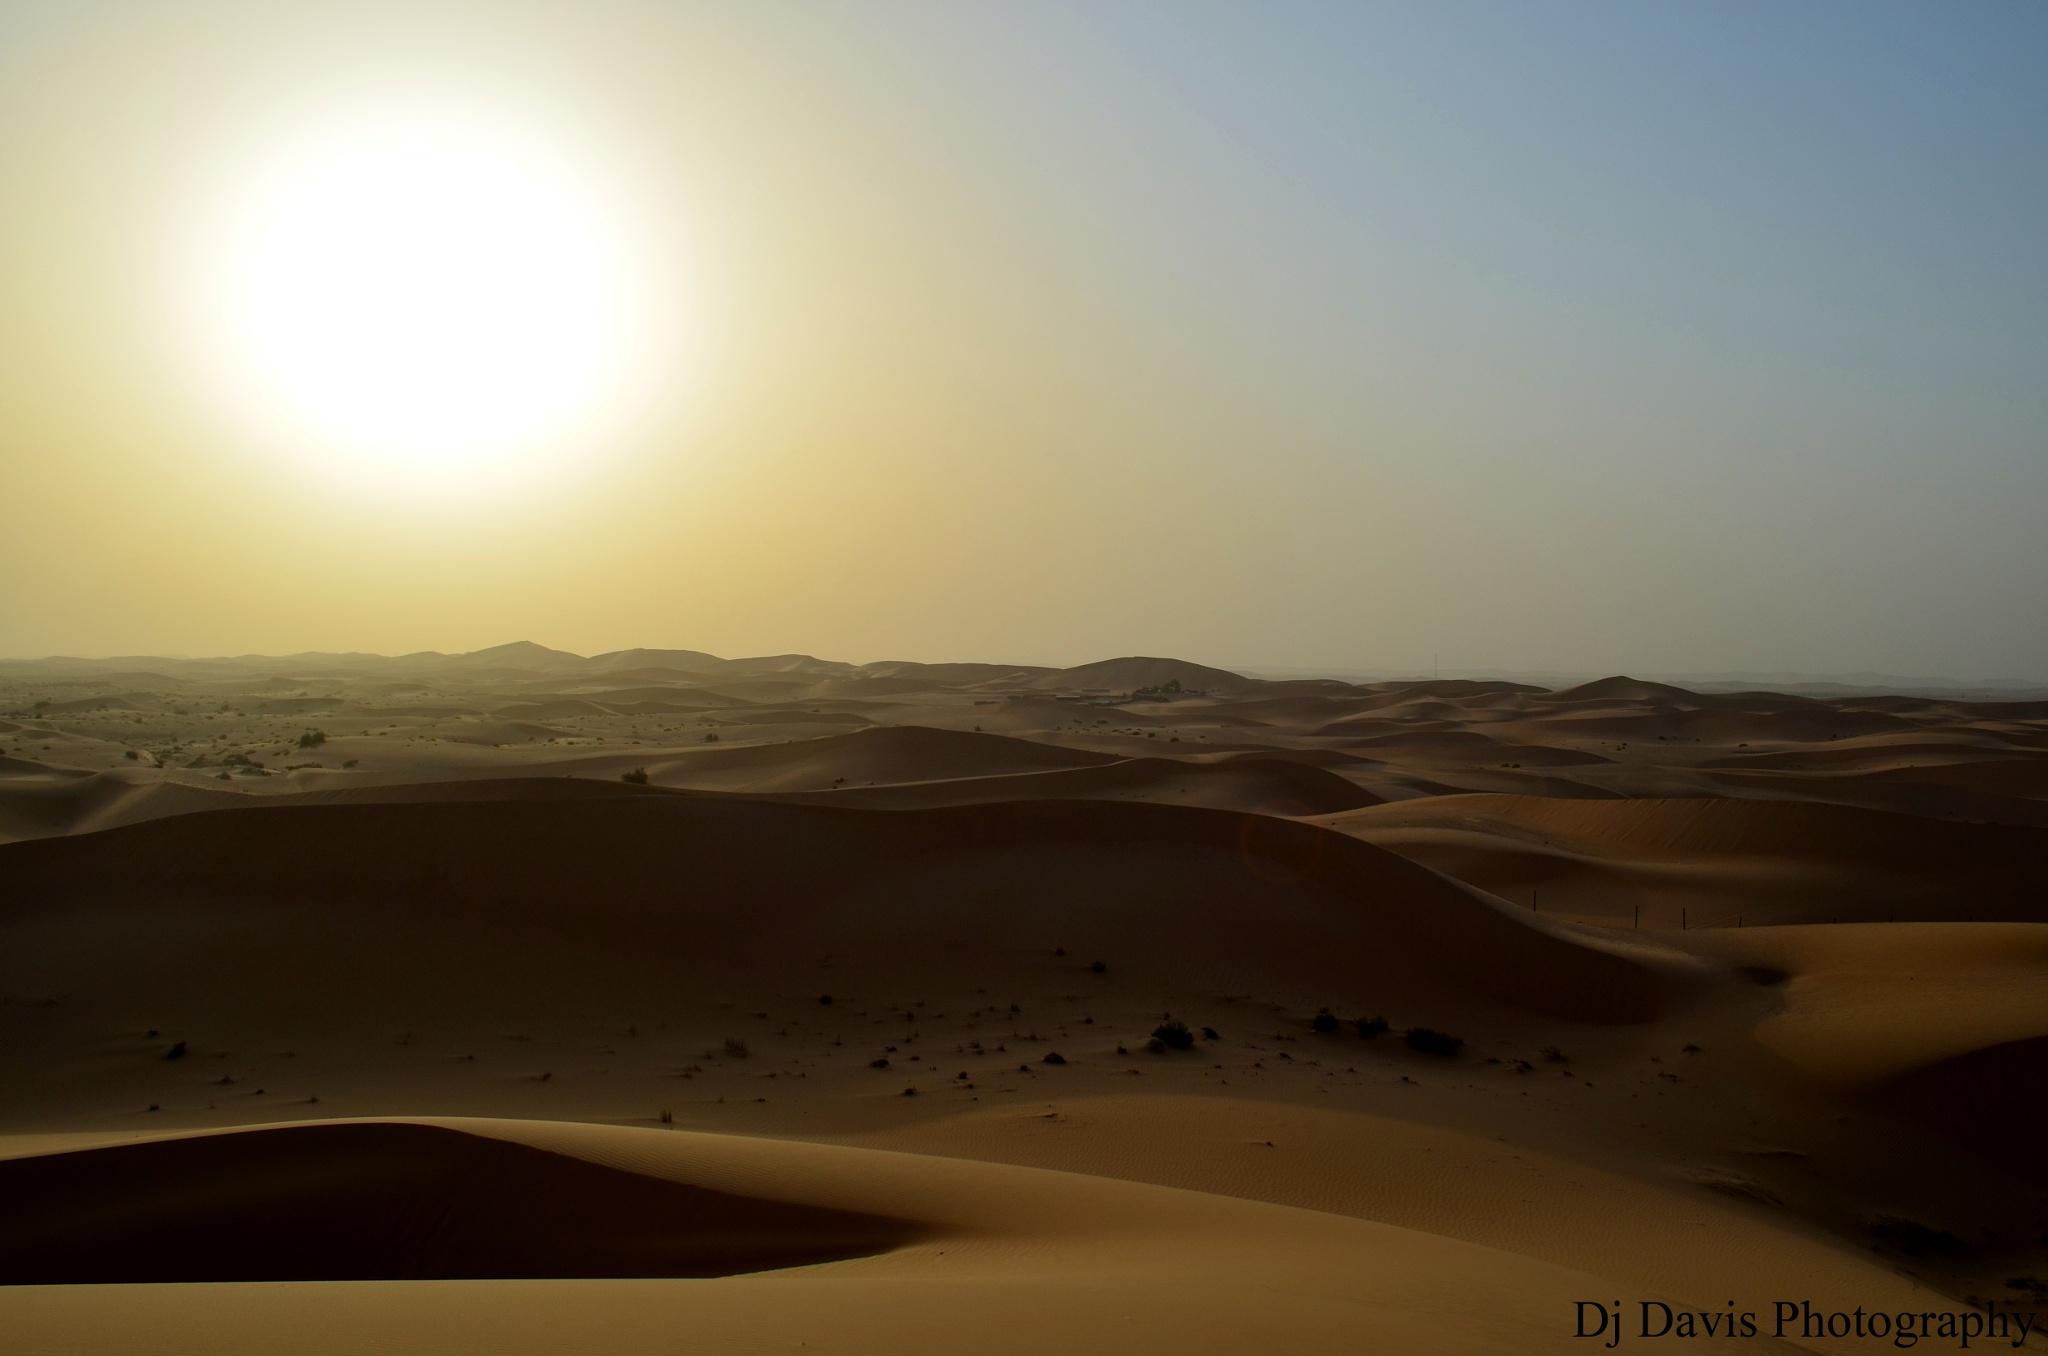 Abu Dhabi desert sunset by D.j. Davis